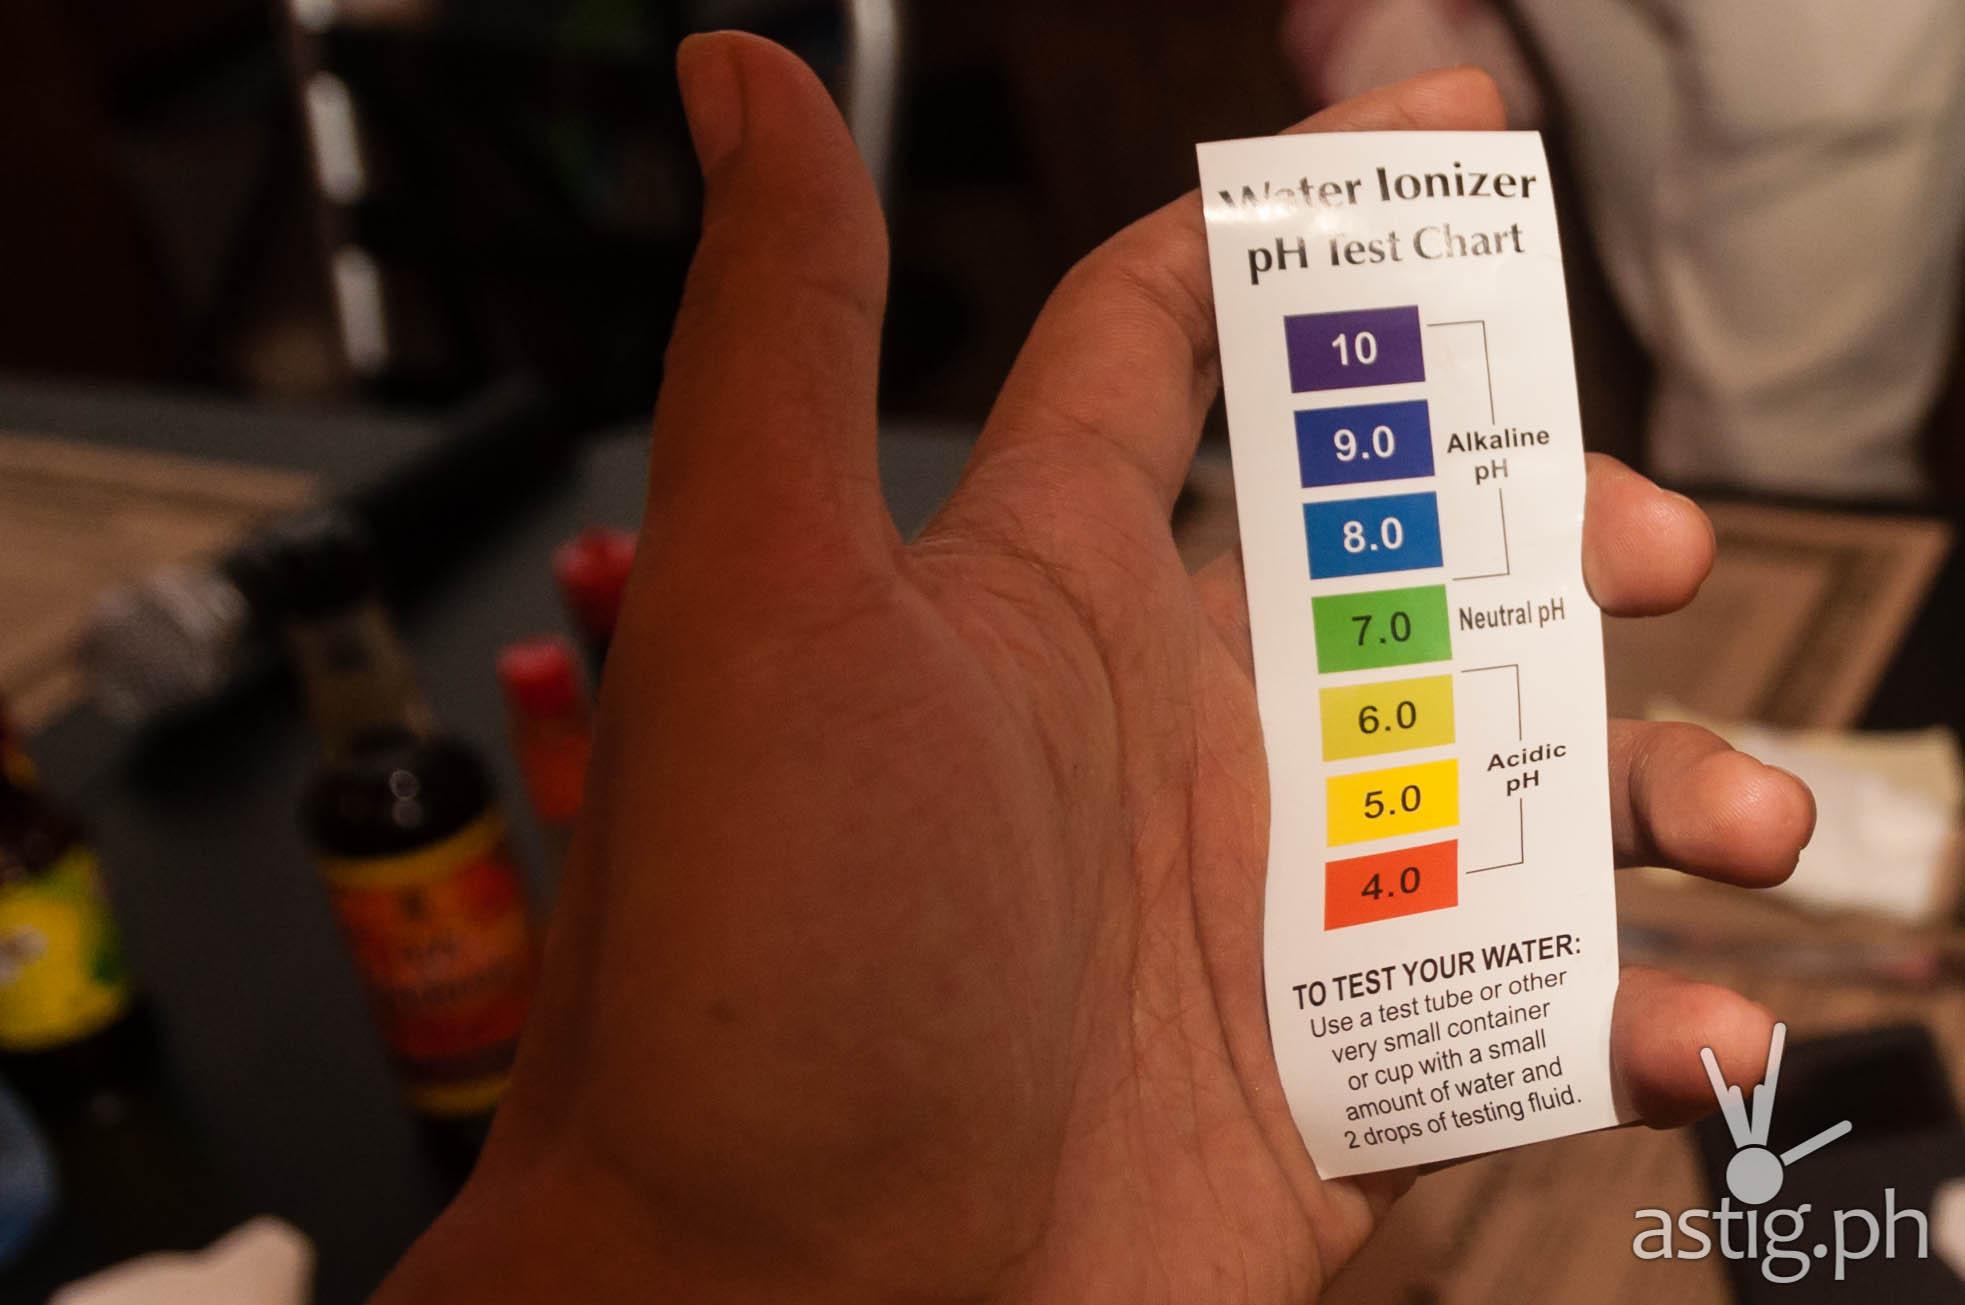 Water ionizer pH test chart